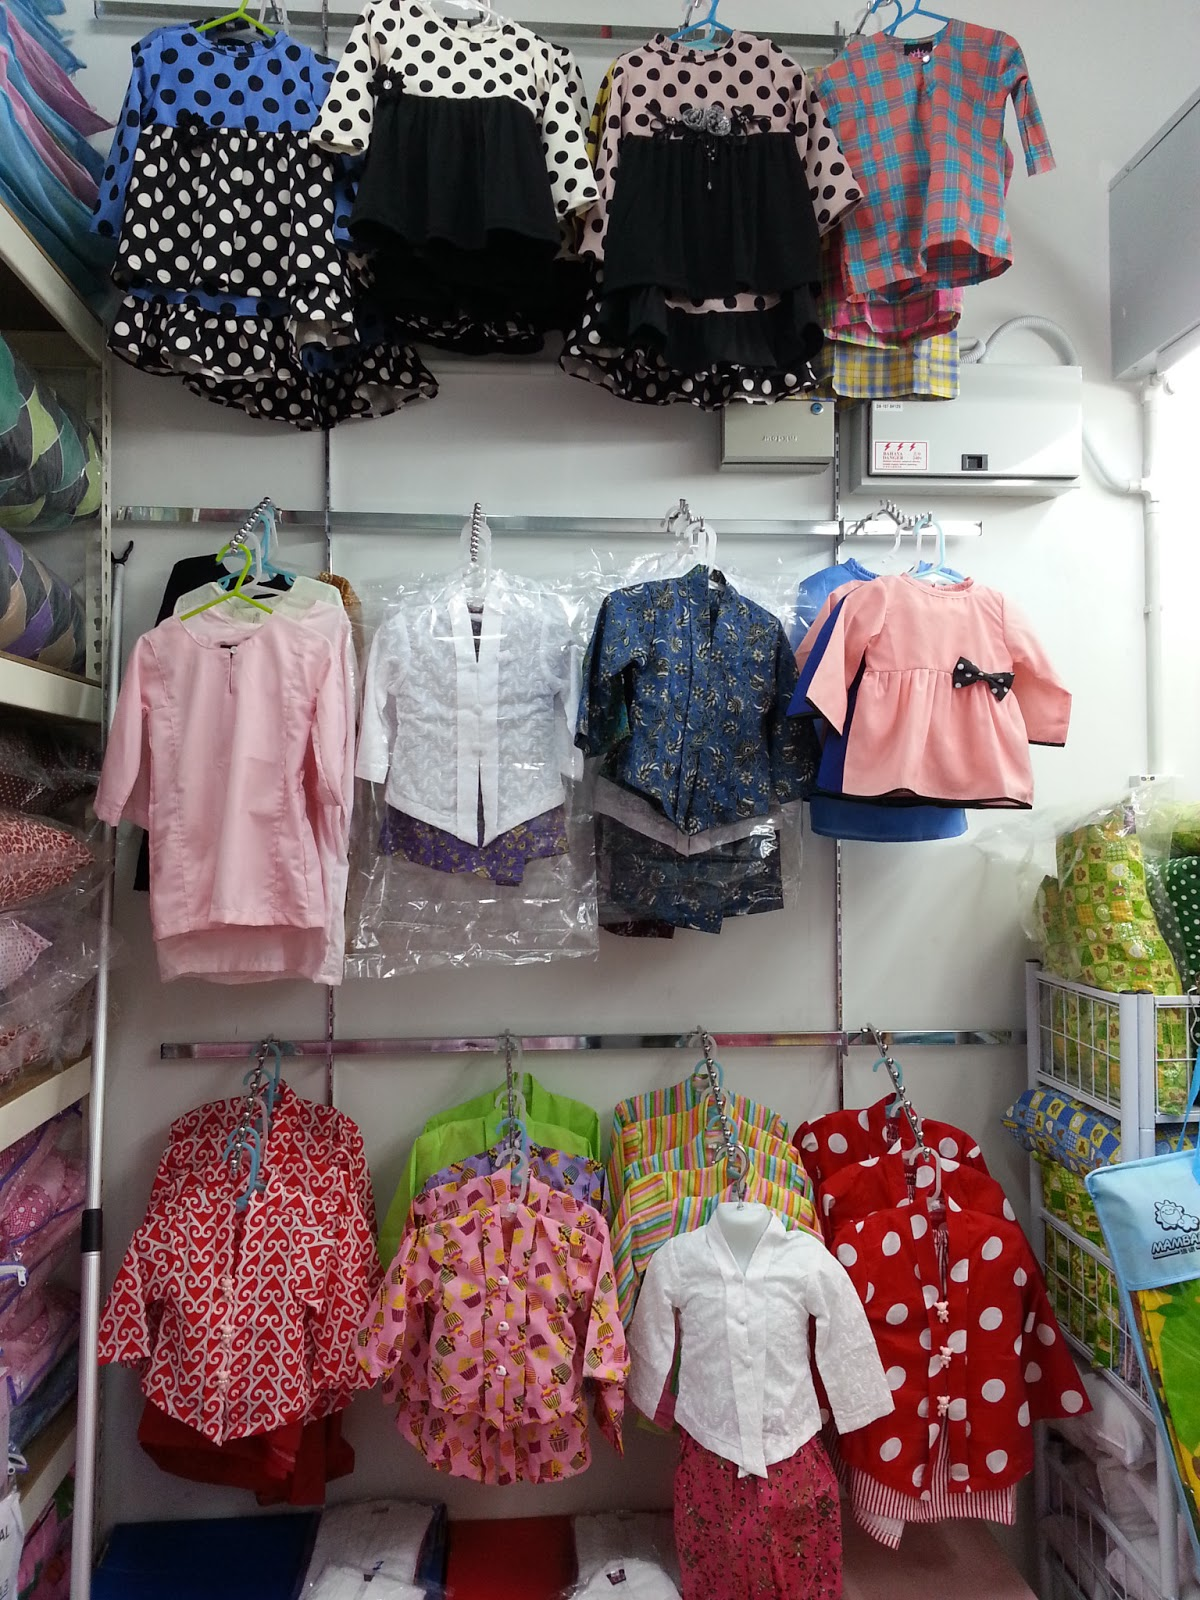 Gosh Moms And Kids Store Gosh Latest Design Baju Kurung Budak Comel2 Kebaya Bayi Dan Peplum Kanak2 Restock Raya 2013